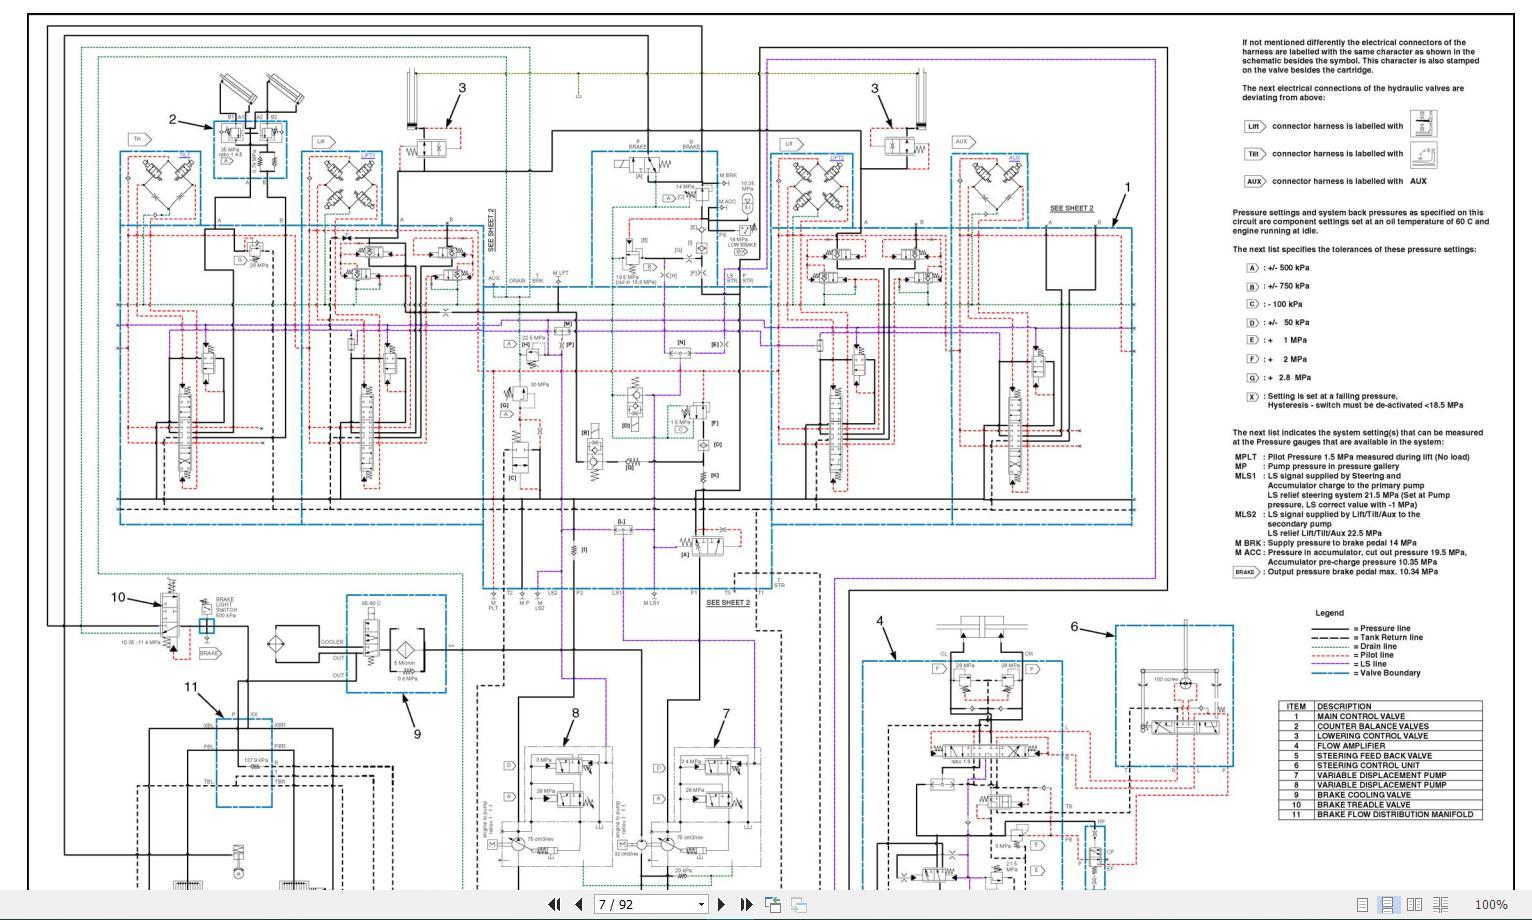 Hyster_Forklift_Class_5_Internal_Combustion_Engine_Trucks_Repair_Manuals14